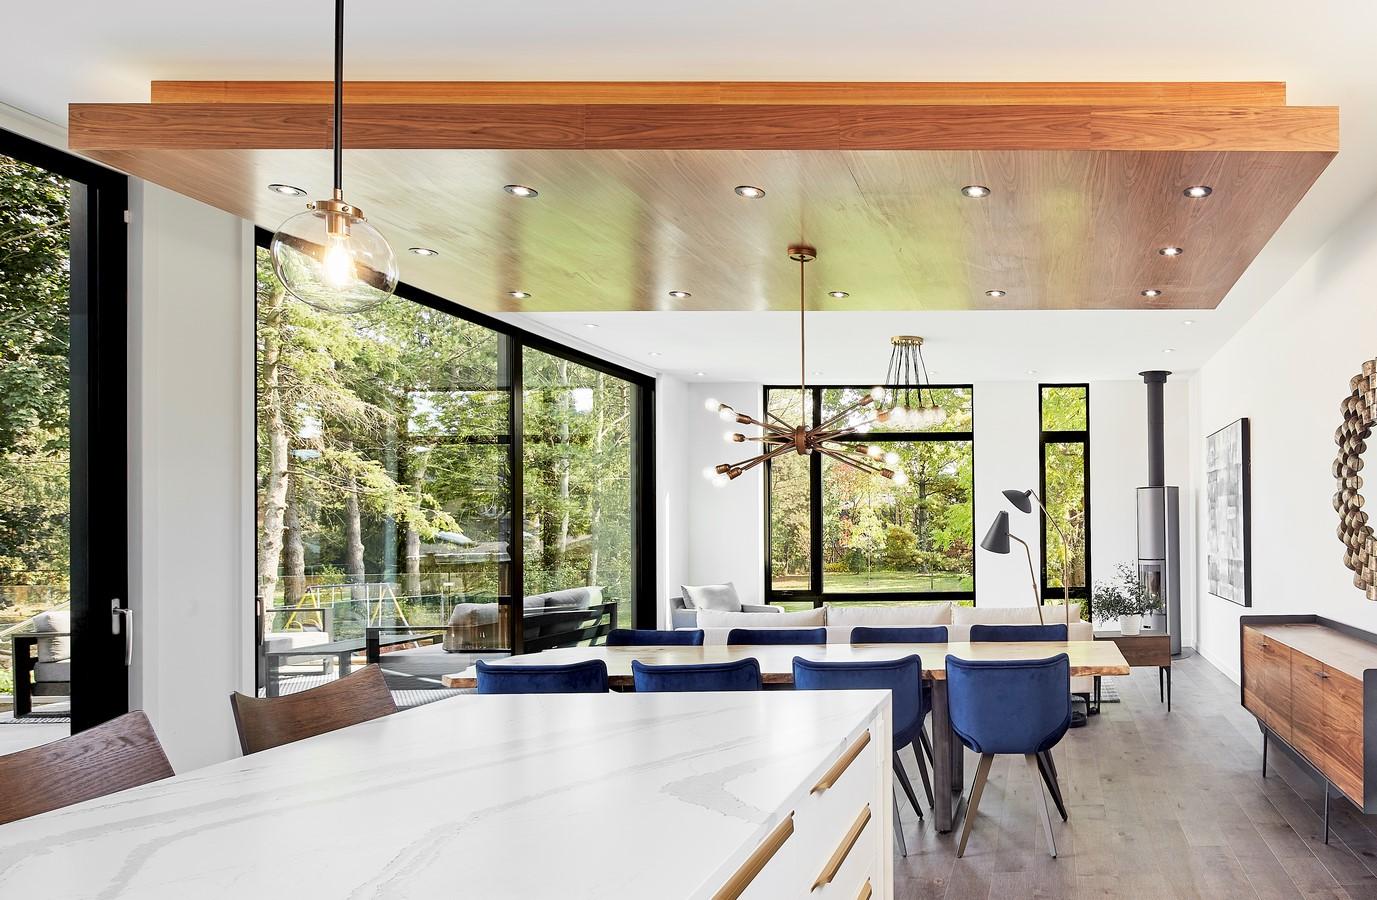 Markham Multi-Generational House by Solares Architecture - Sheet3